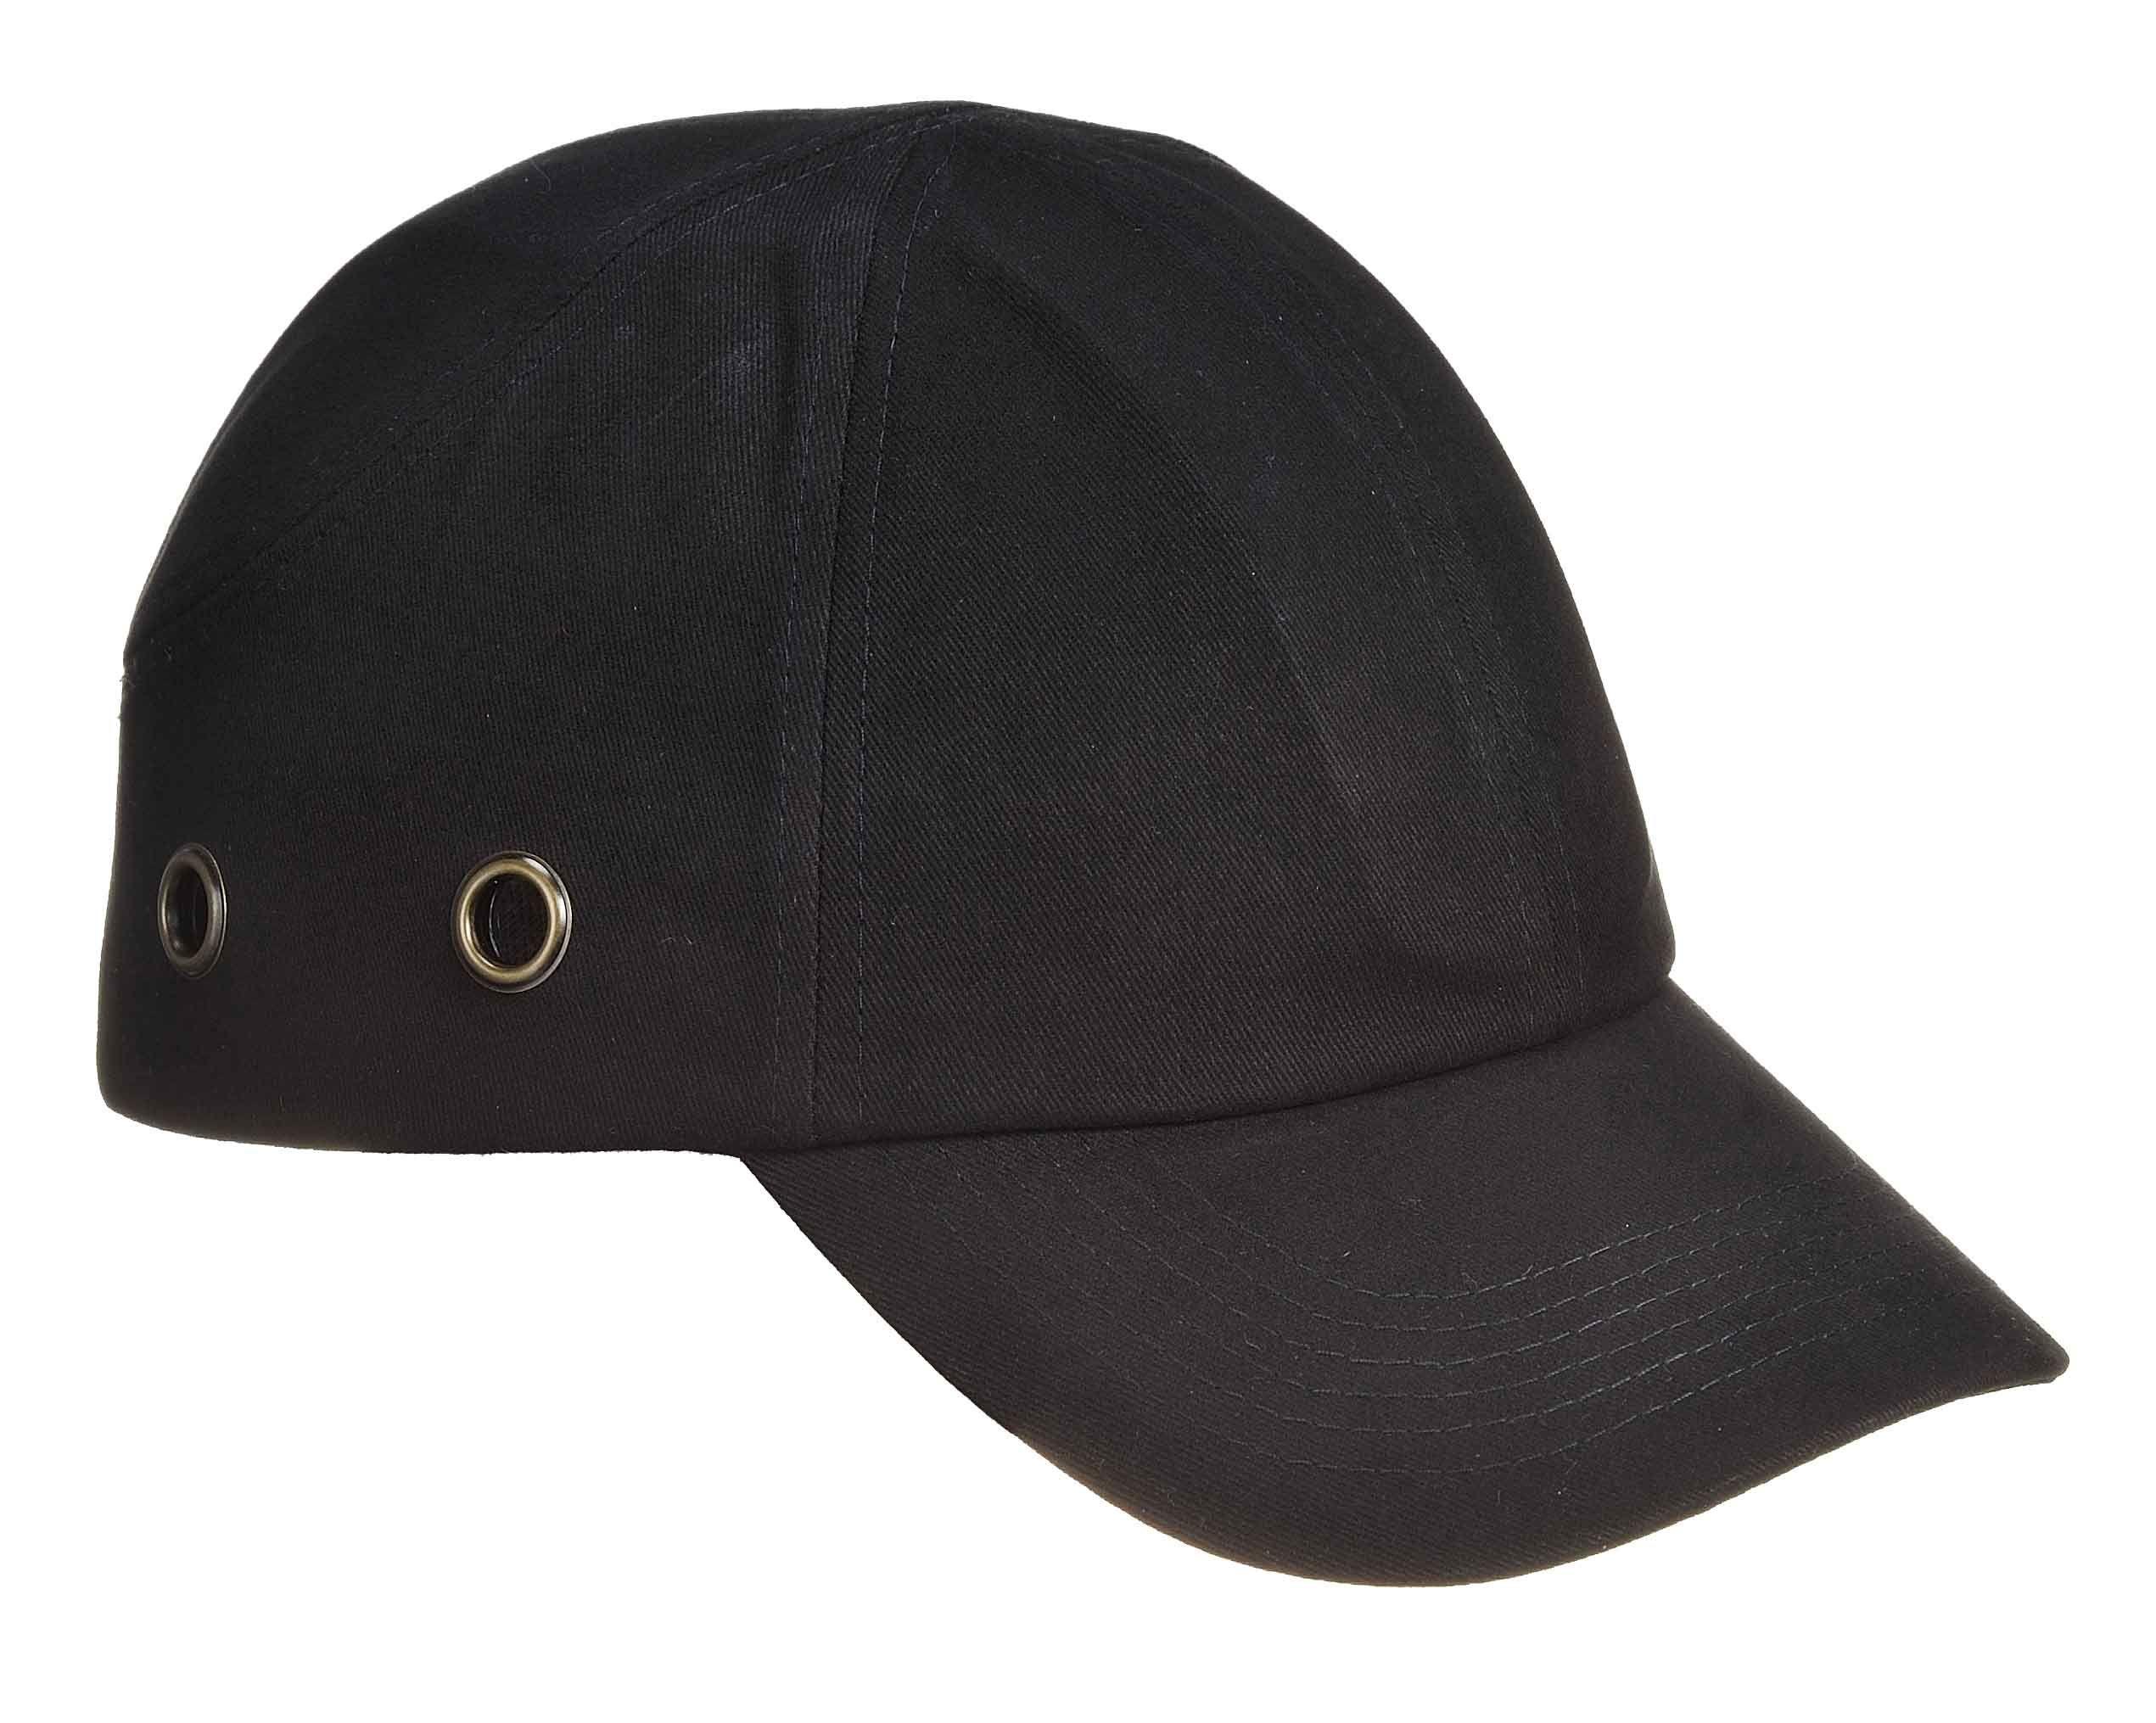 new baseball style safety bump cap hard hat helmet protective gear